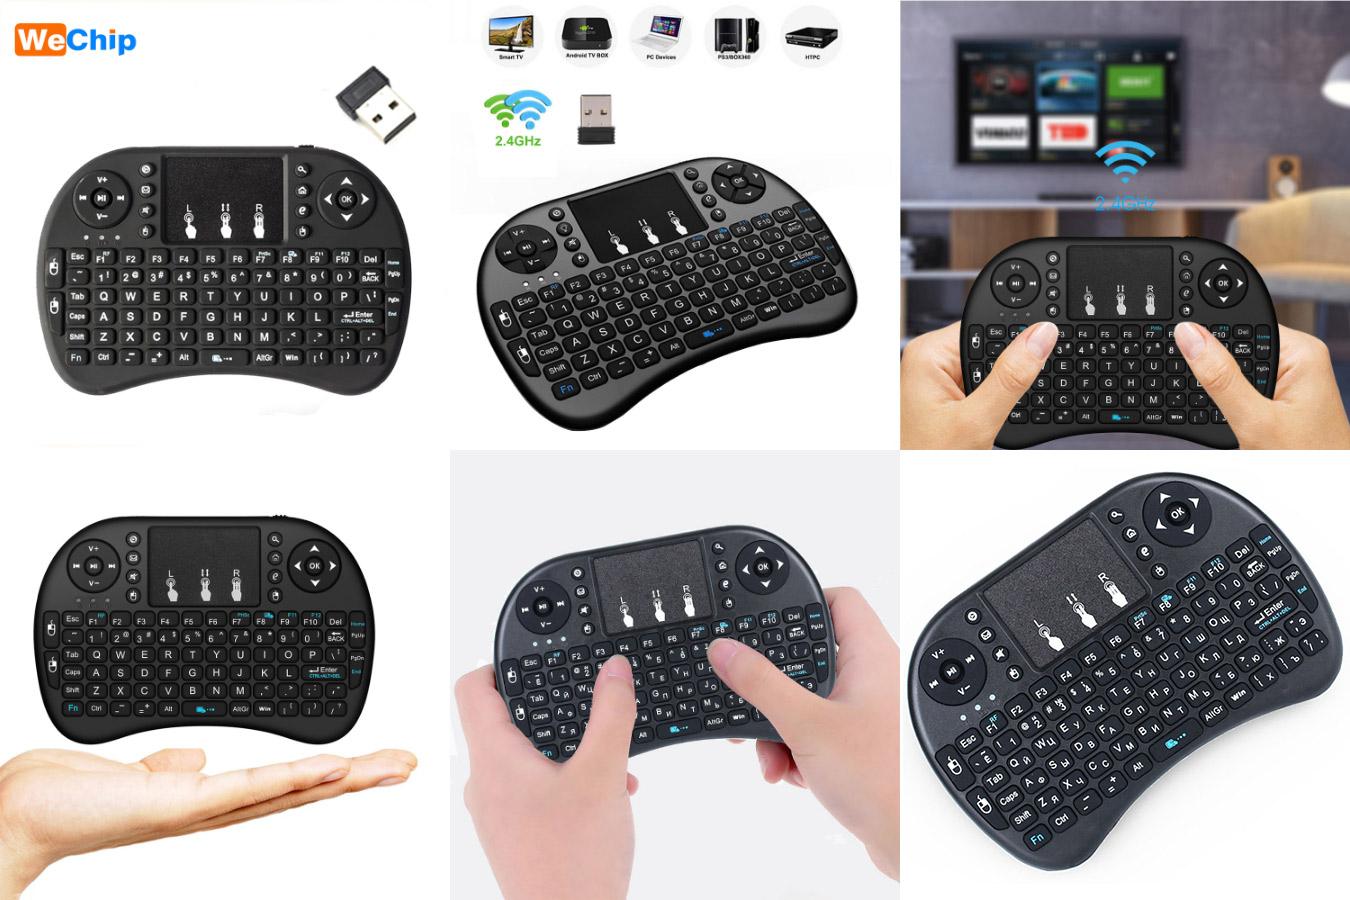 Мультимедийная мини-клавиатура Wechip i8